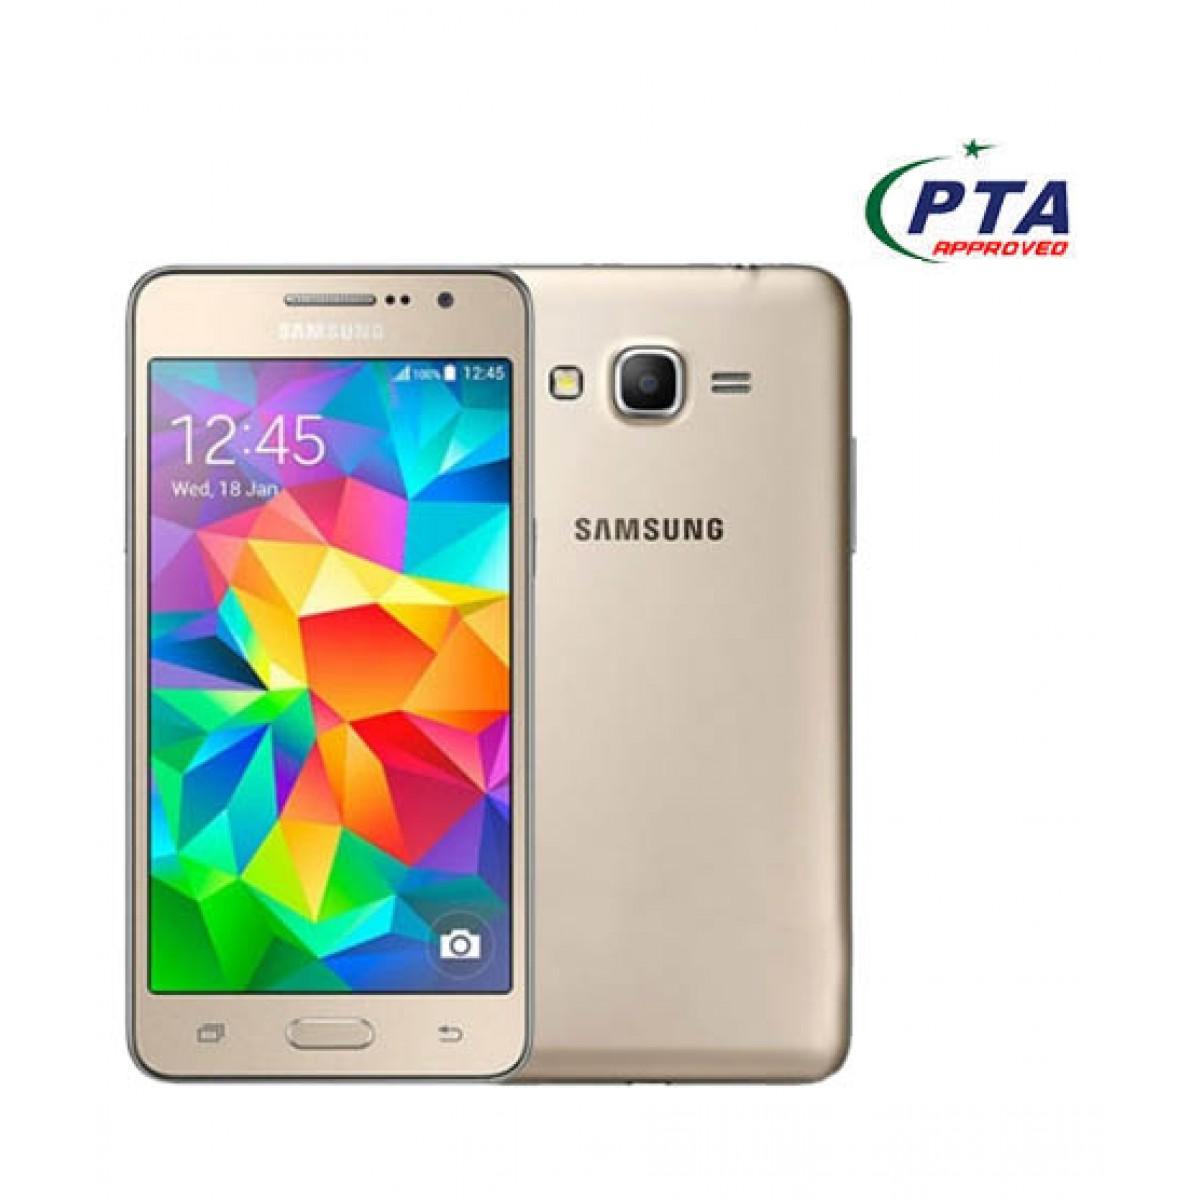 Samsung Galaxy Grand Prime 3G Gold (G531H)